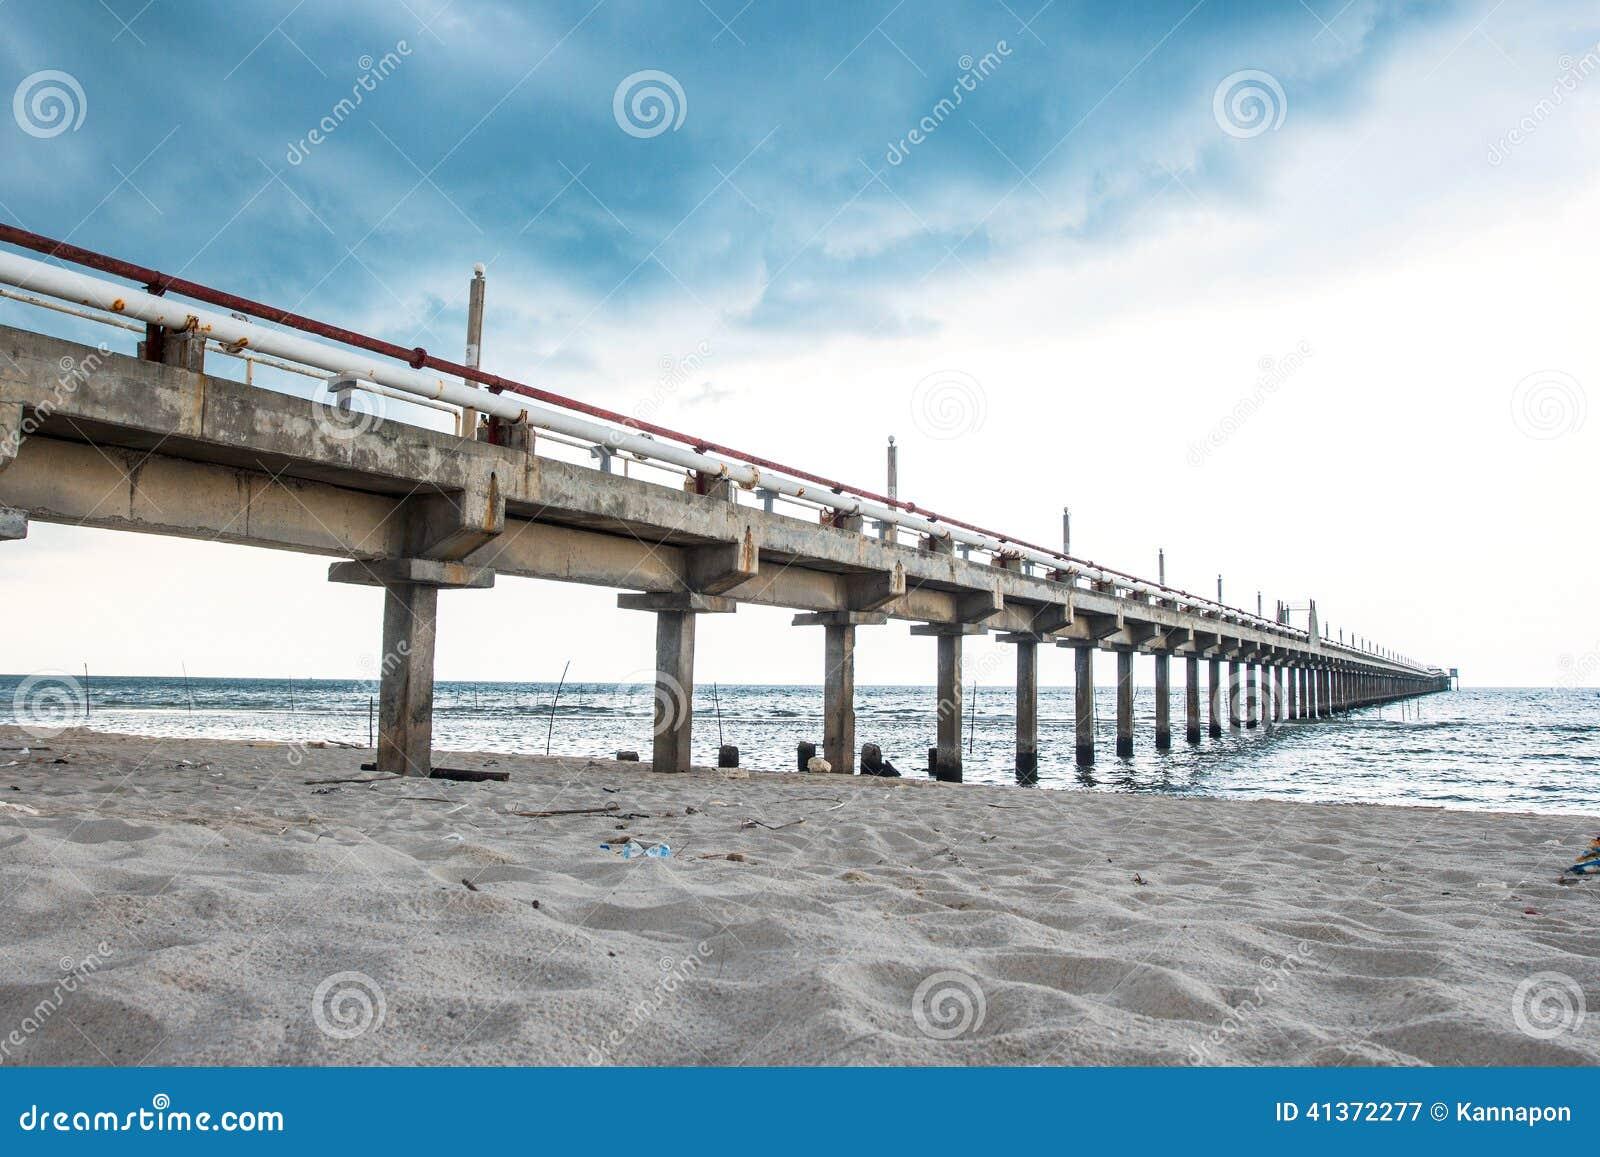 Fishing Bridge And Oil Jetty Stock Image - Image of ...